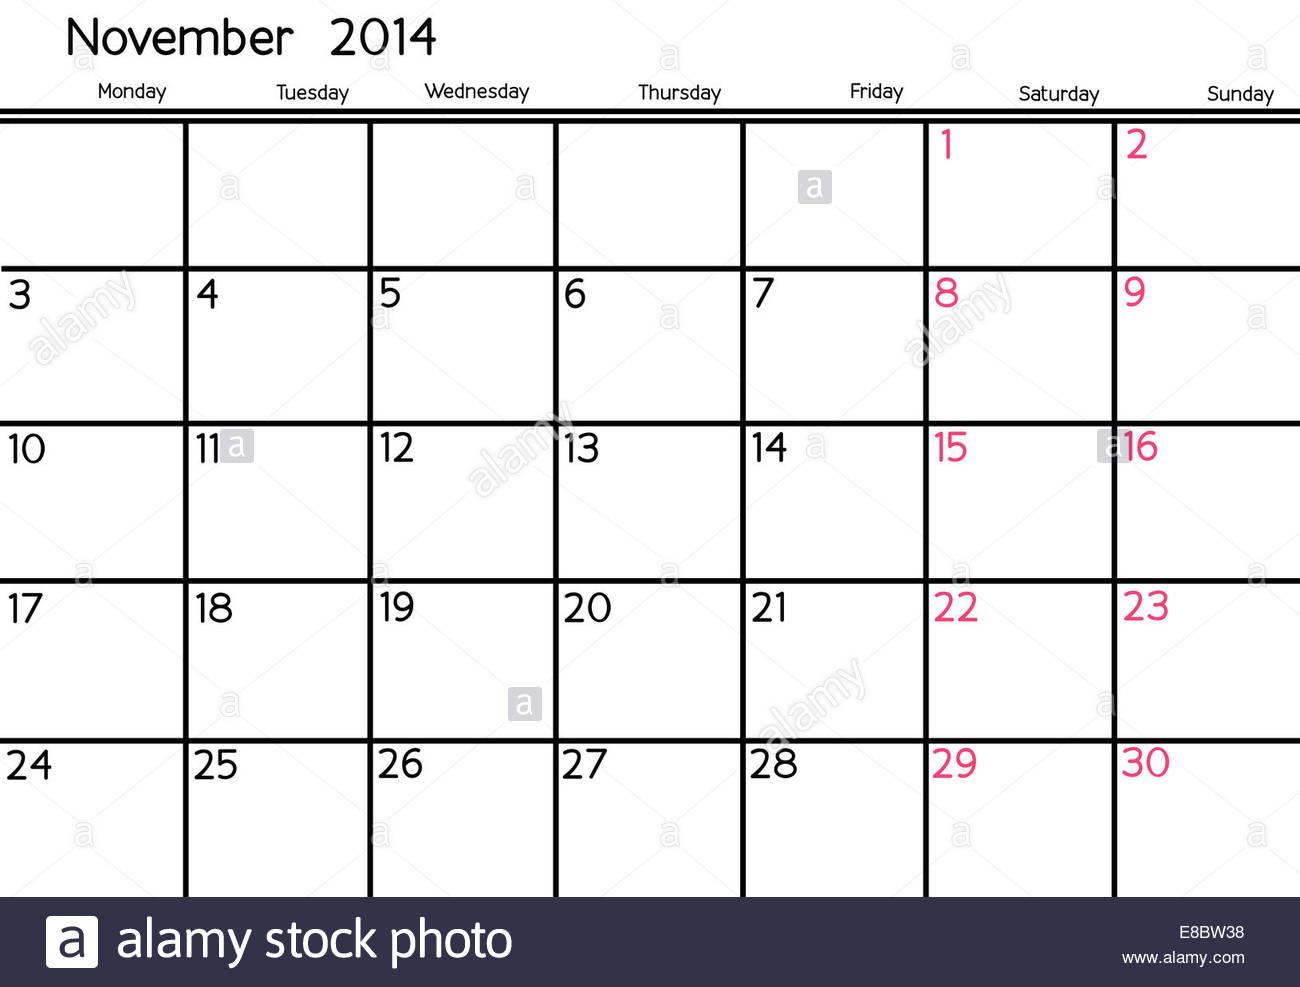 Blank Calendar Of November, 2014 Stock Photo: 74019884  Alamy within Blank Calendar 2014